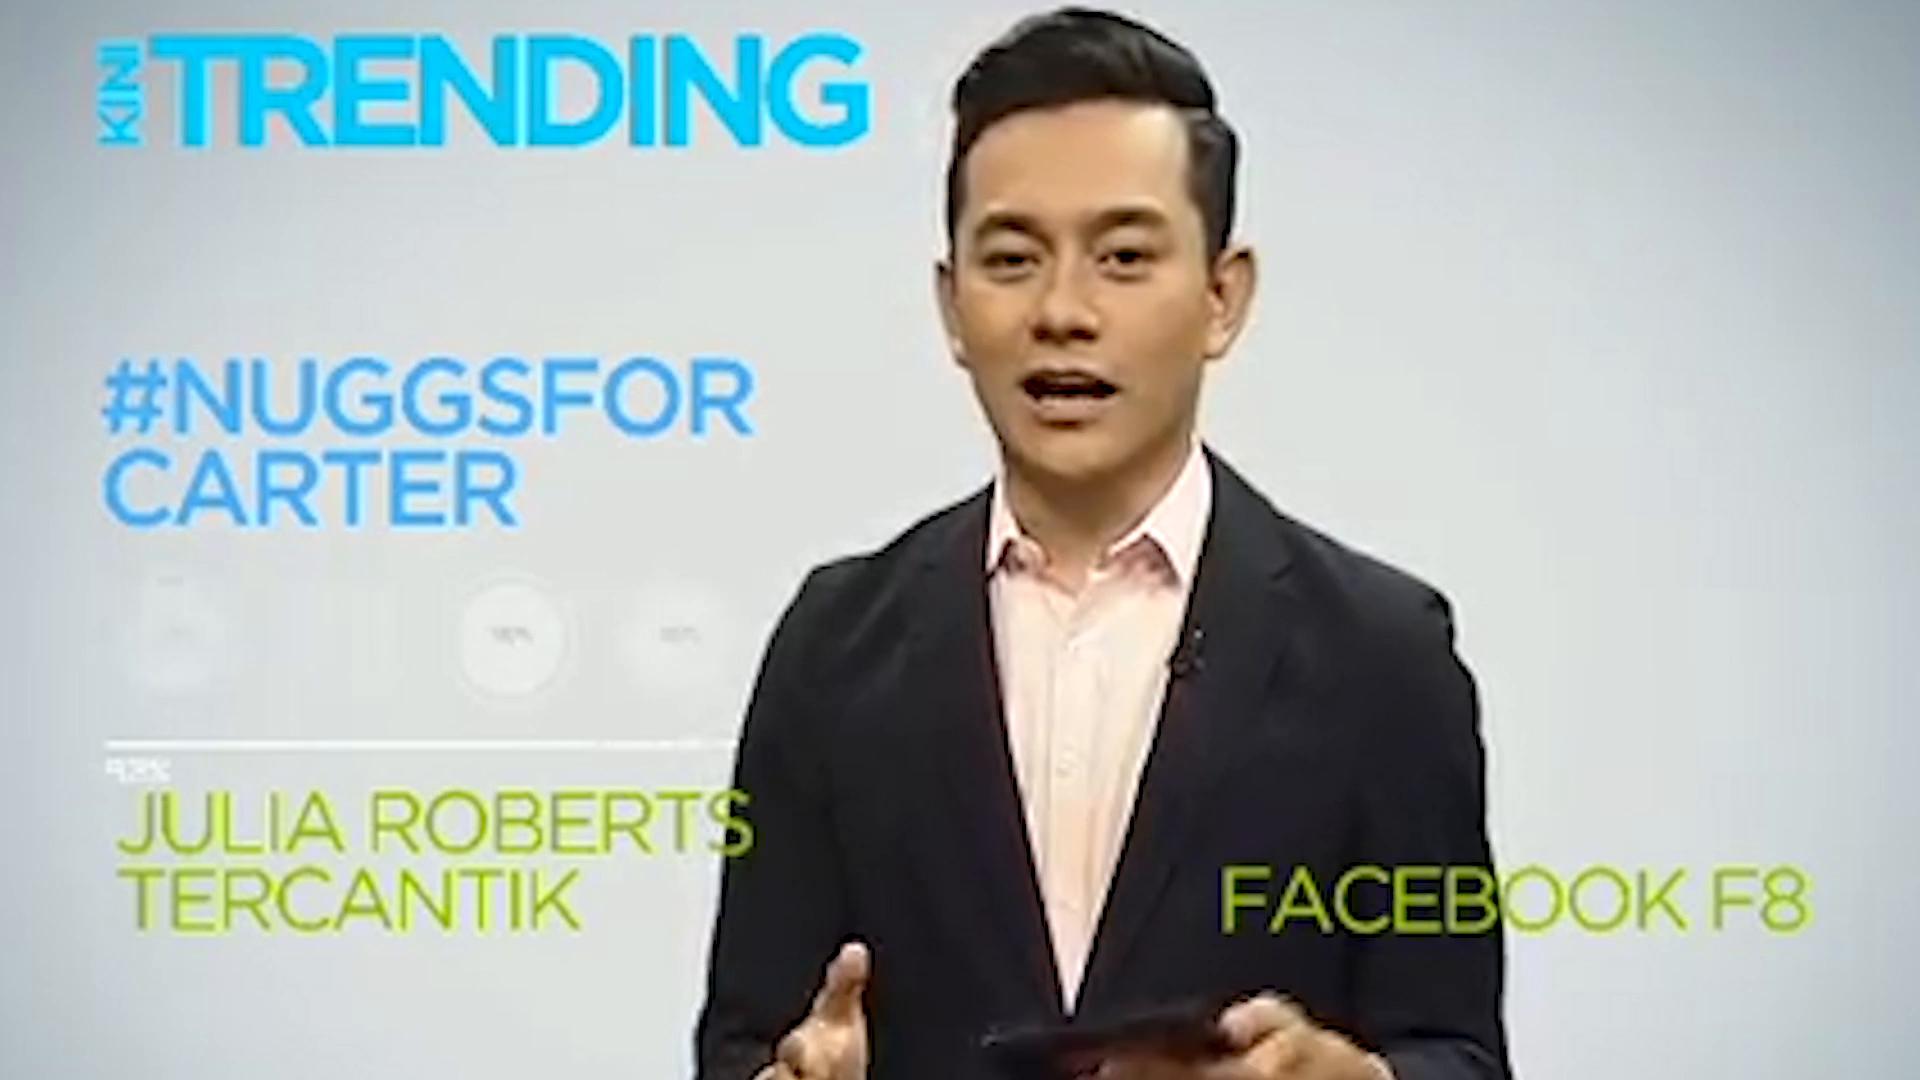 Thumbnail for #NuggsForCarter